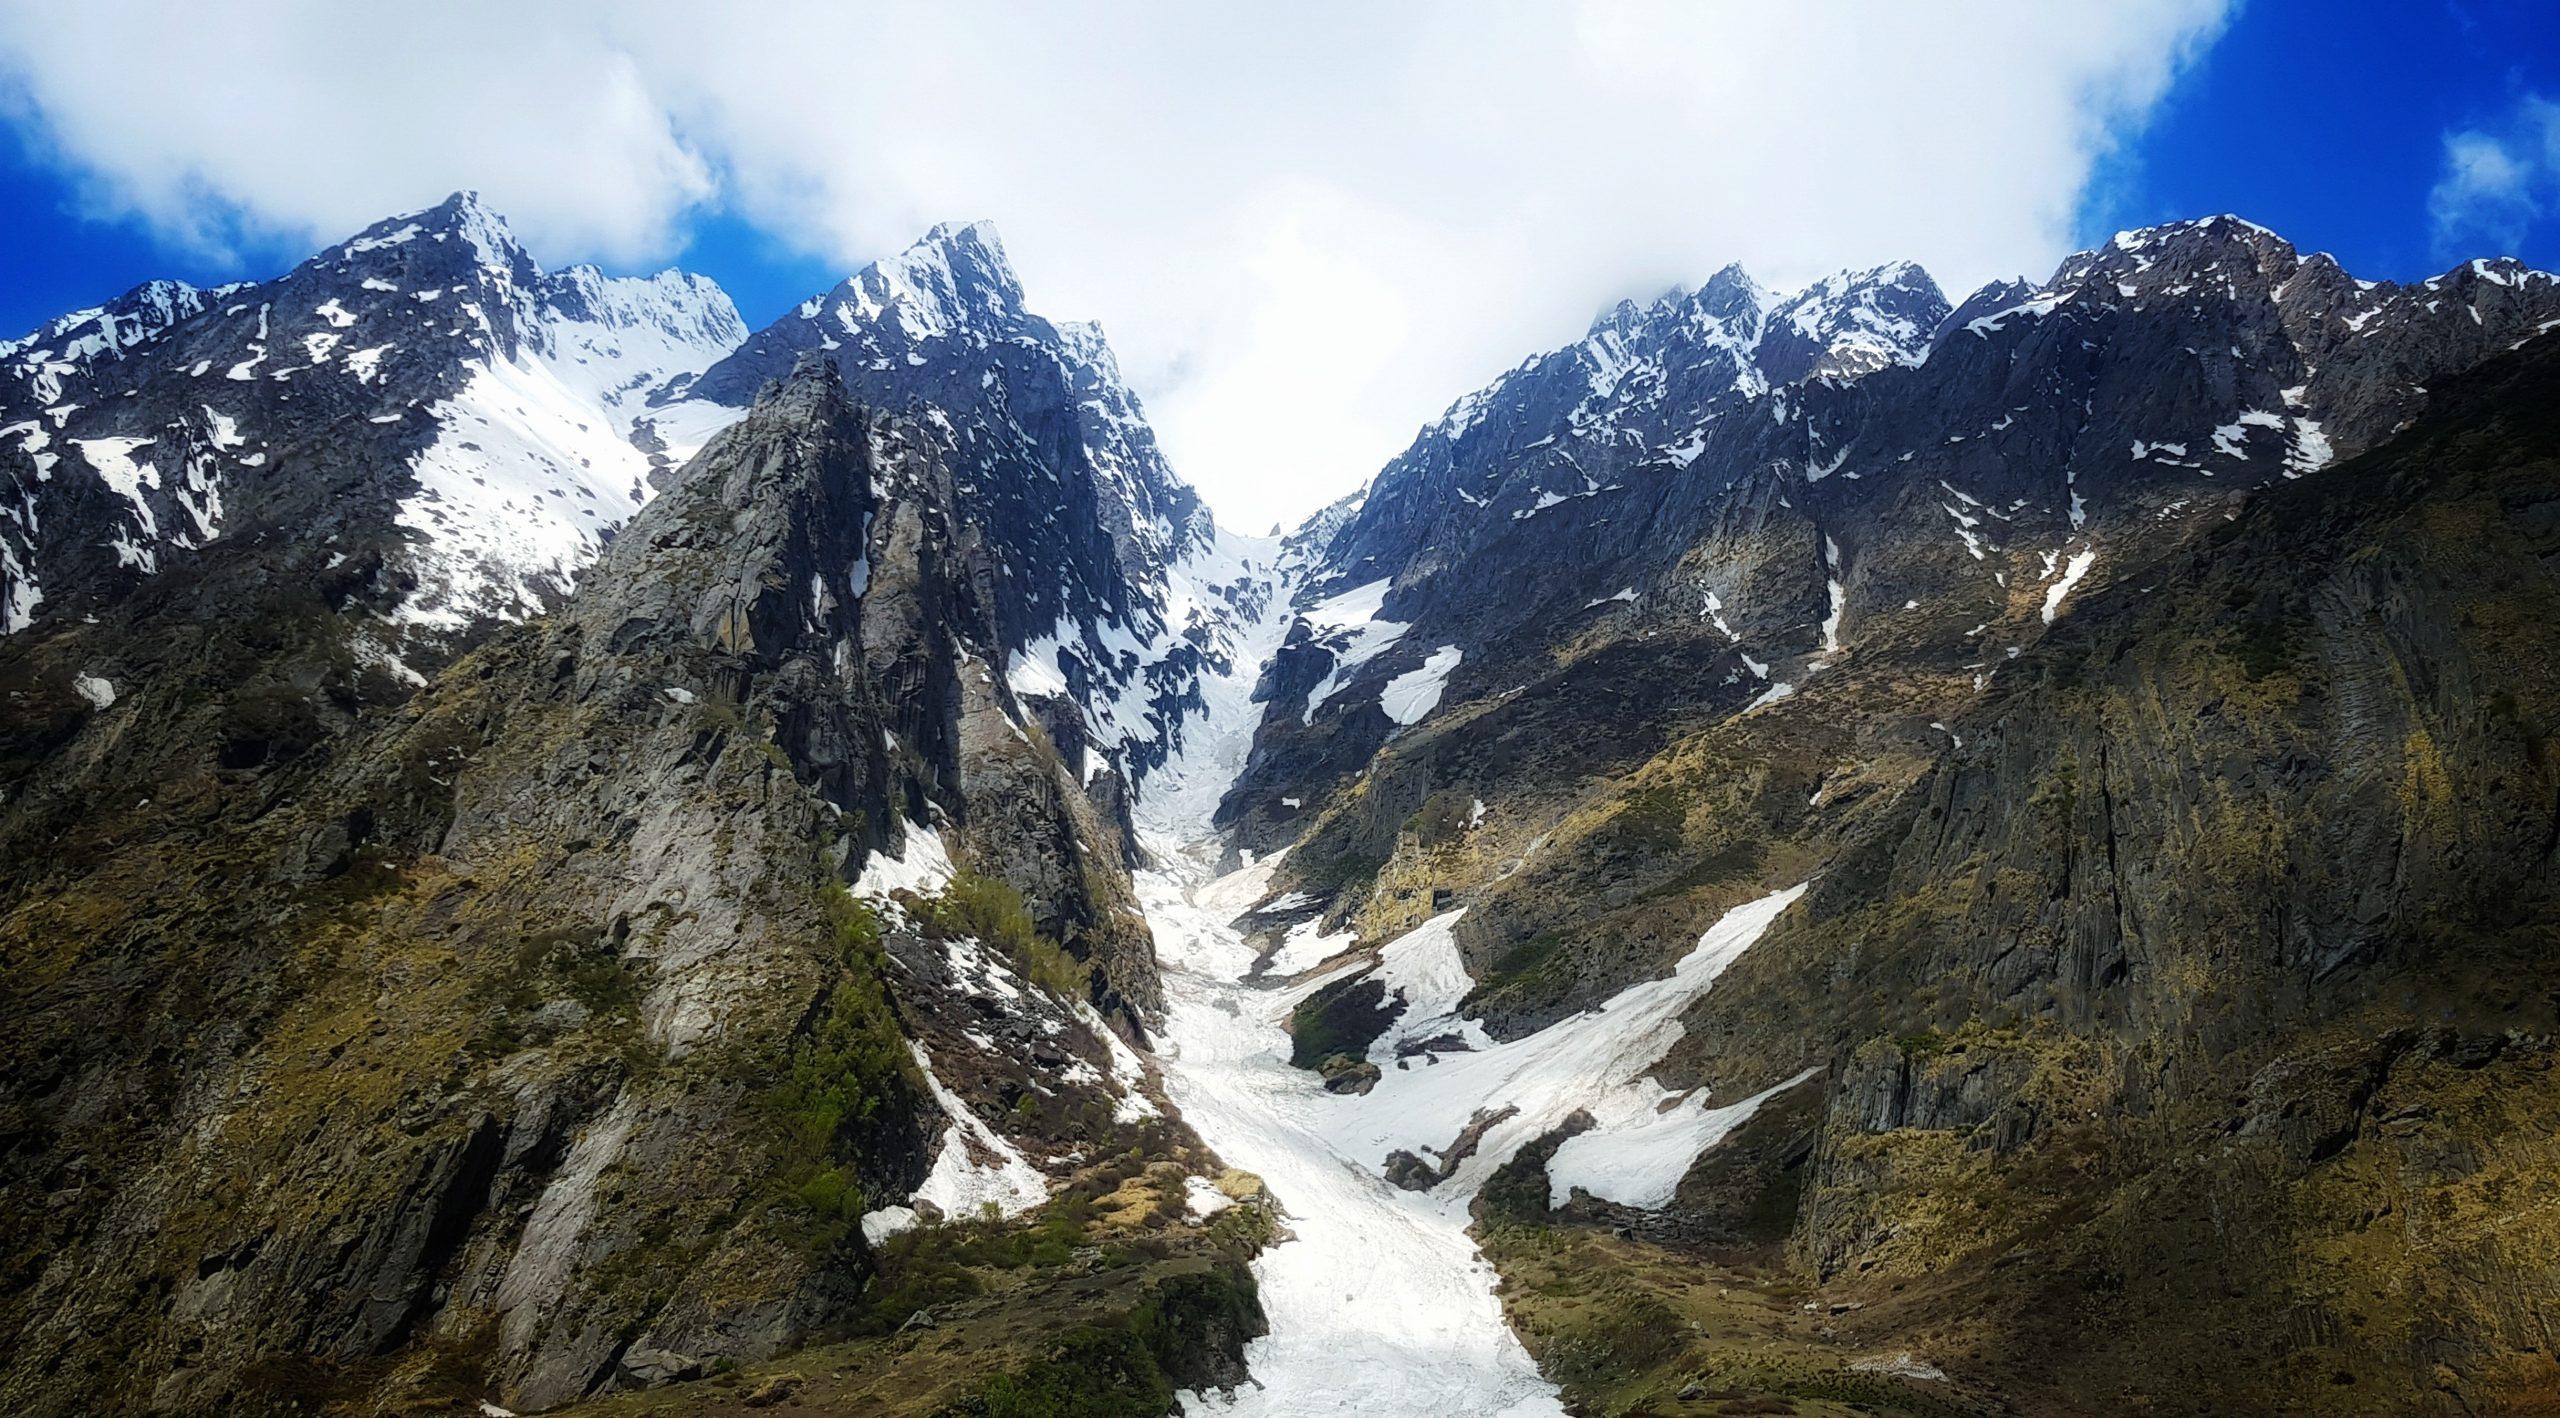 Badrinath snowy mountains